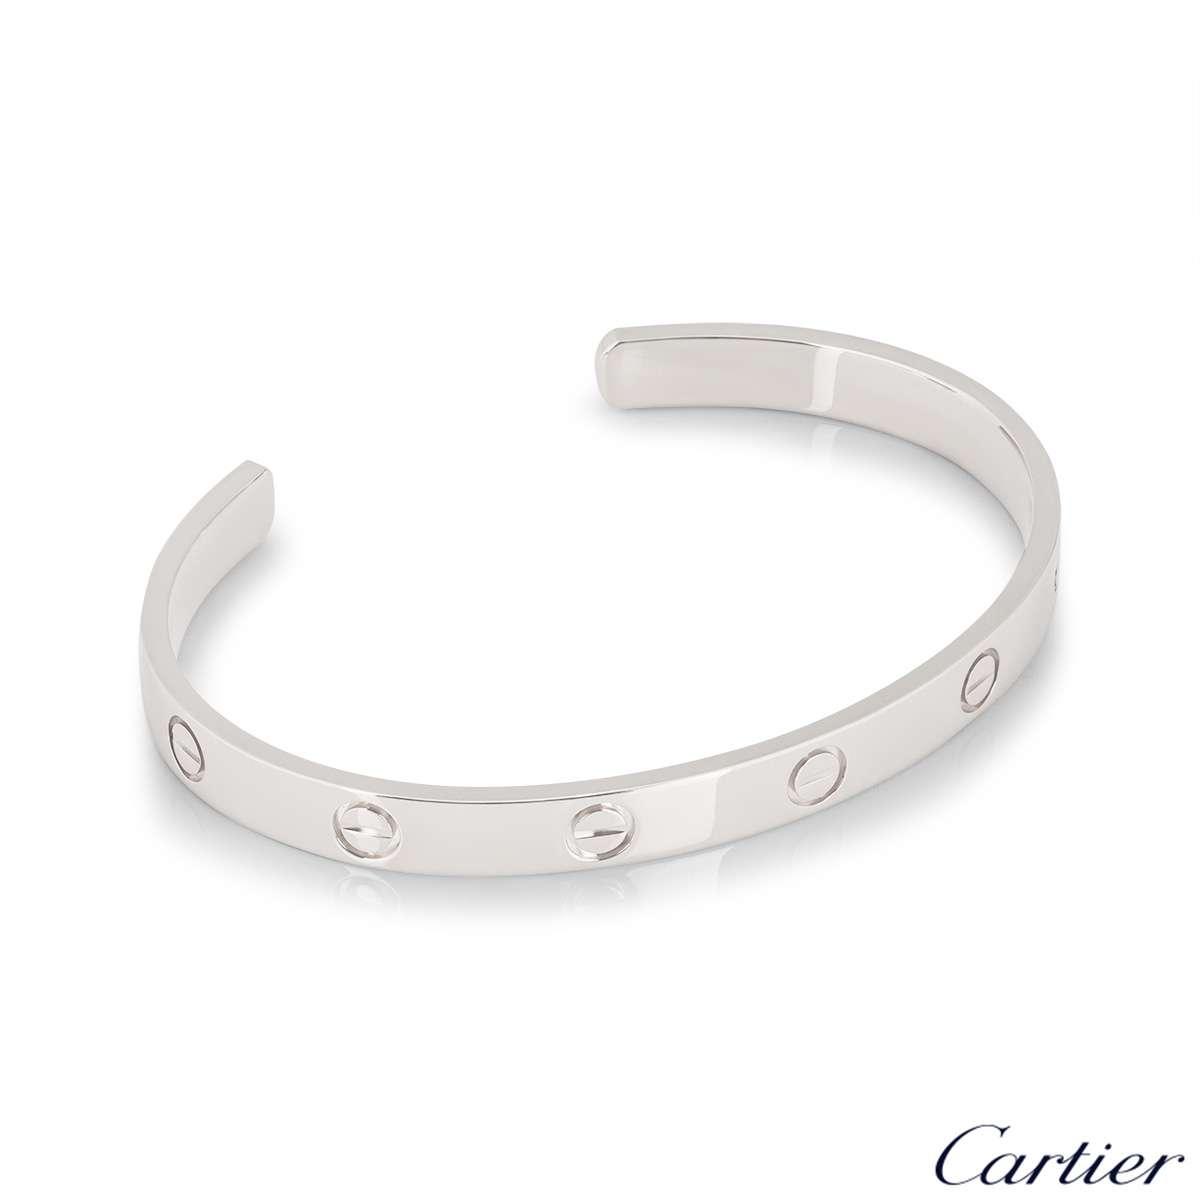 Cartier White Gold Plain Love Cuff Bracelet Size 19 B6032519